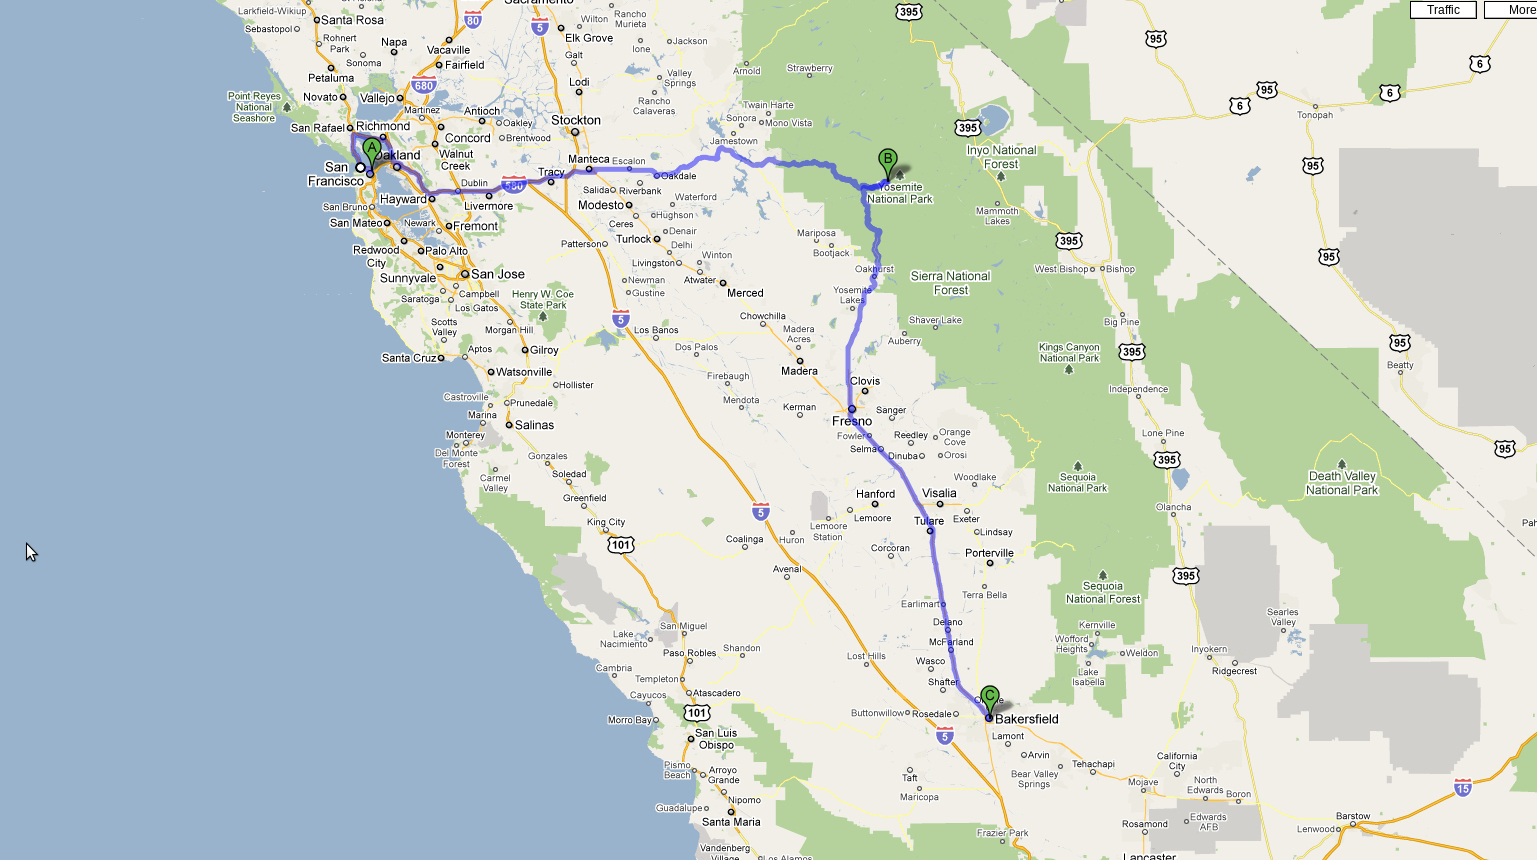 Day Road Maps California Nevada Arizona - Tuquyhai - California Nevada Arizona Map